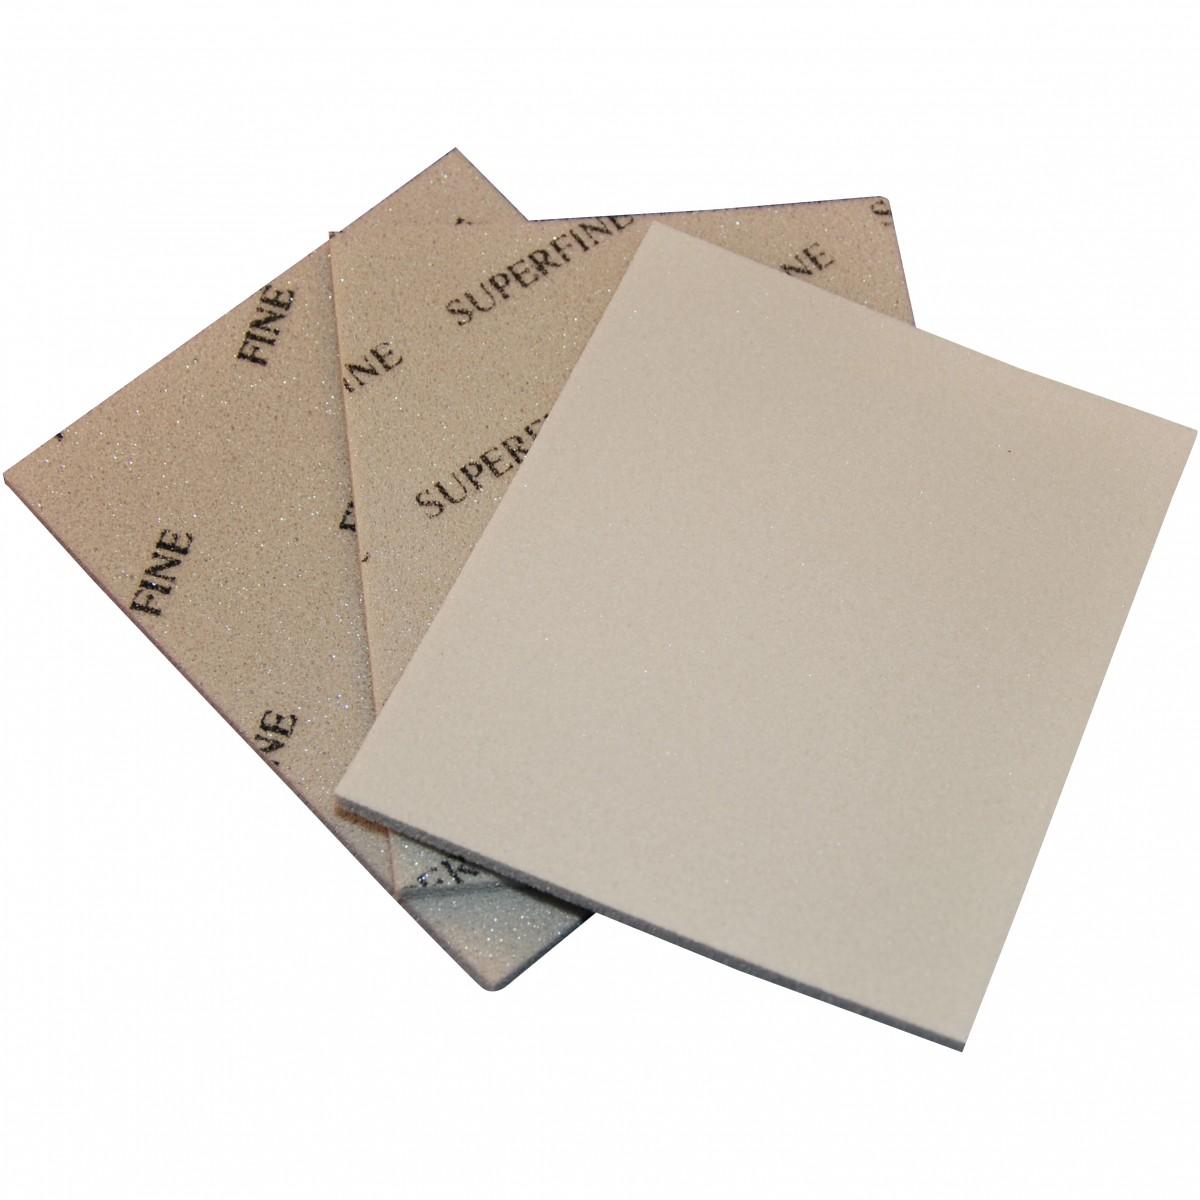 Soft sanding pads / slibesvampe - 115x140x5mm